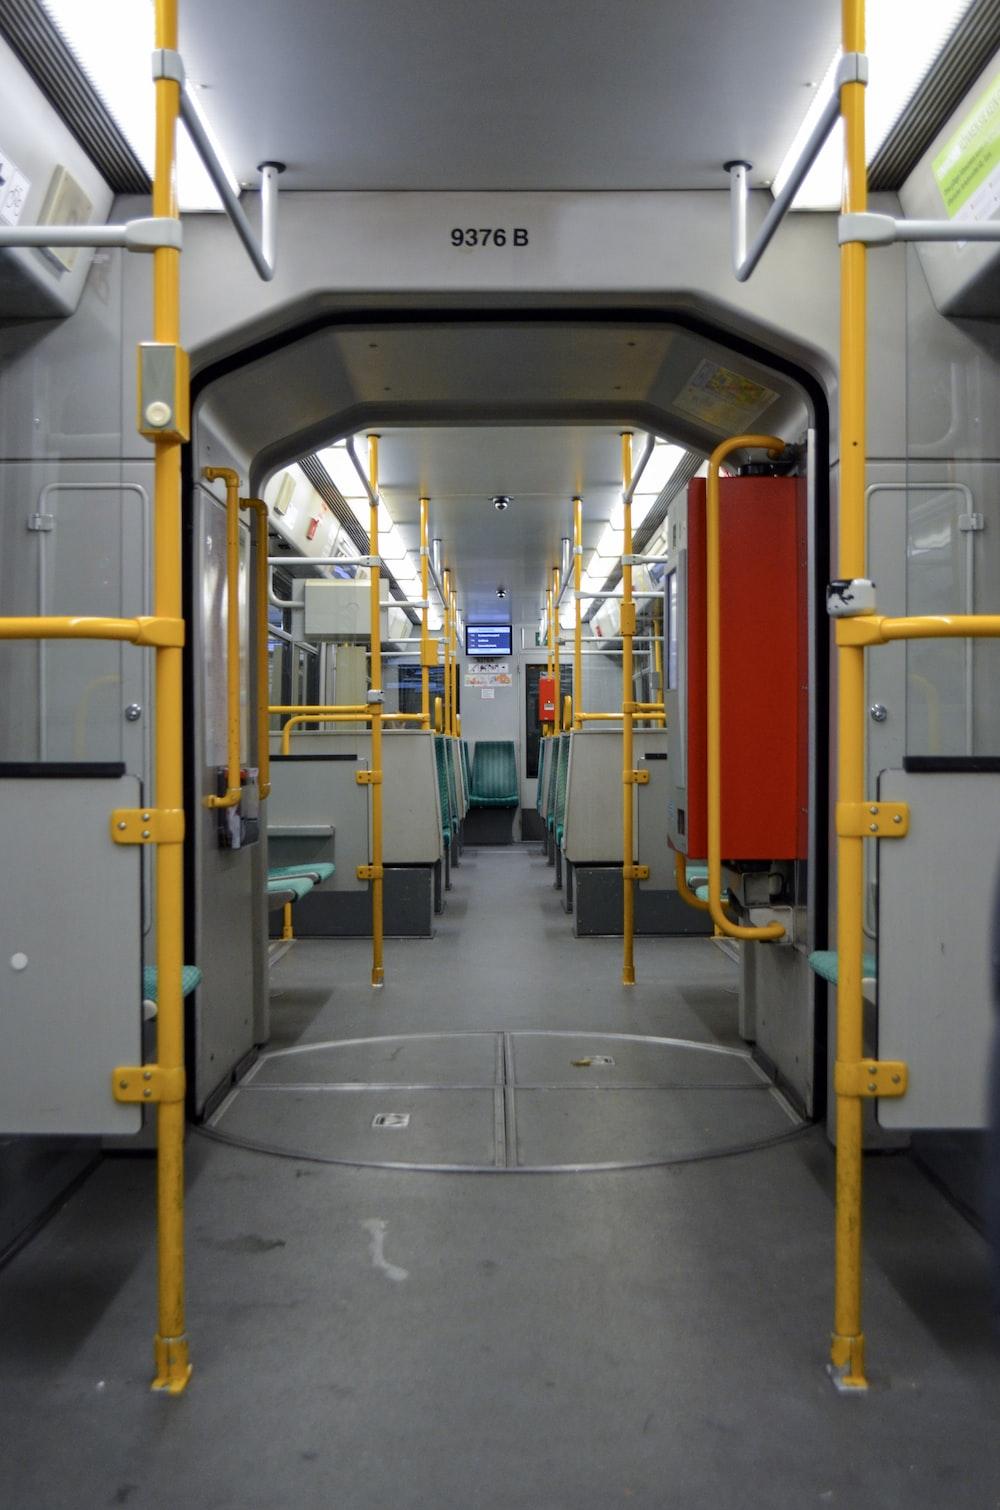 grey train interior